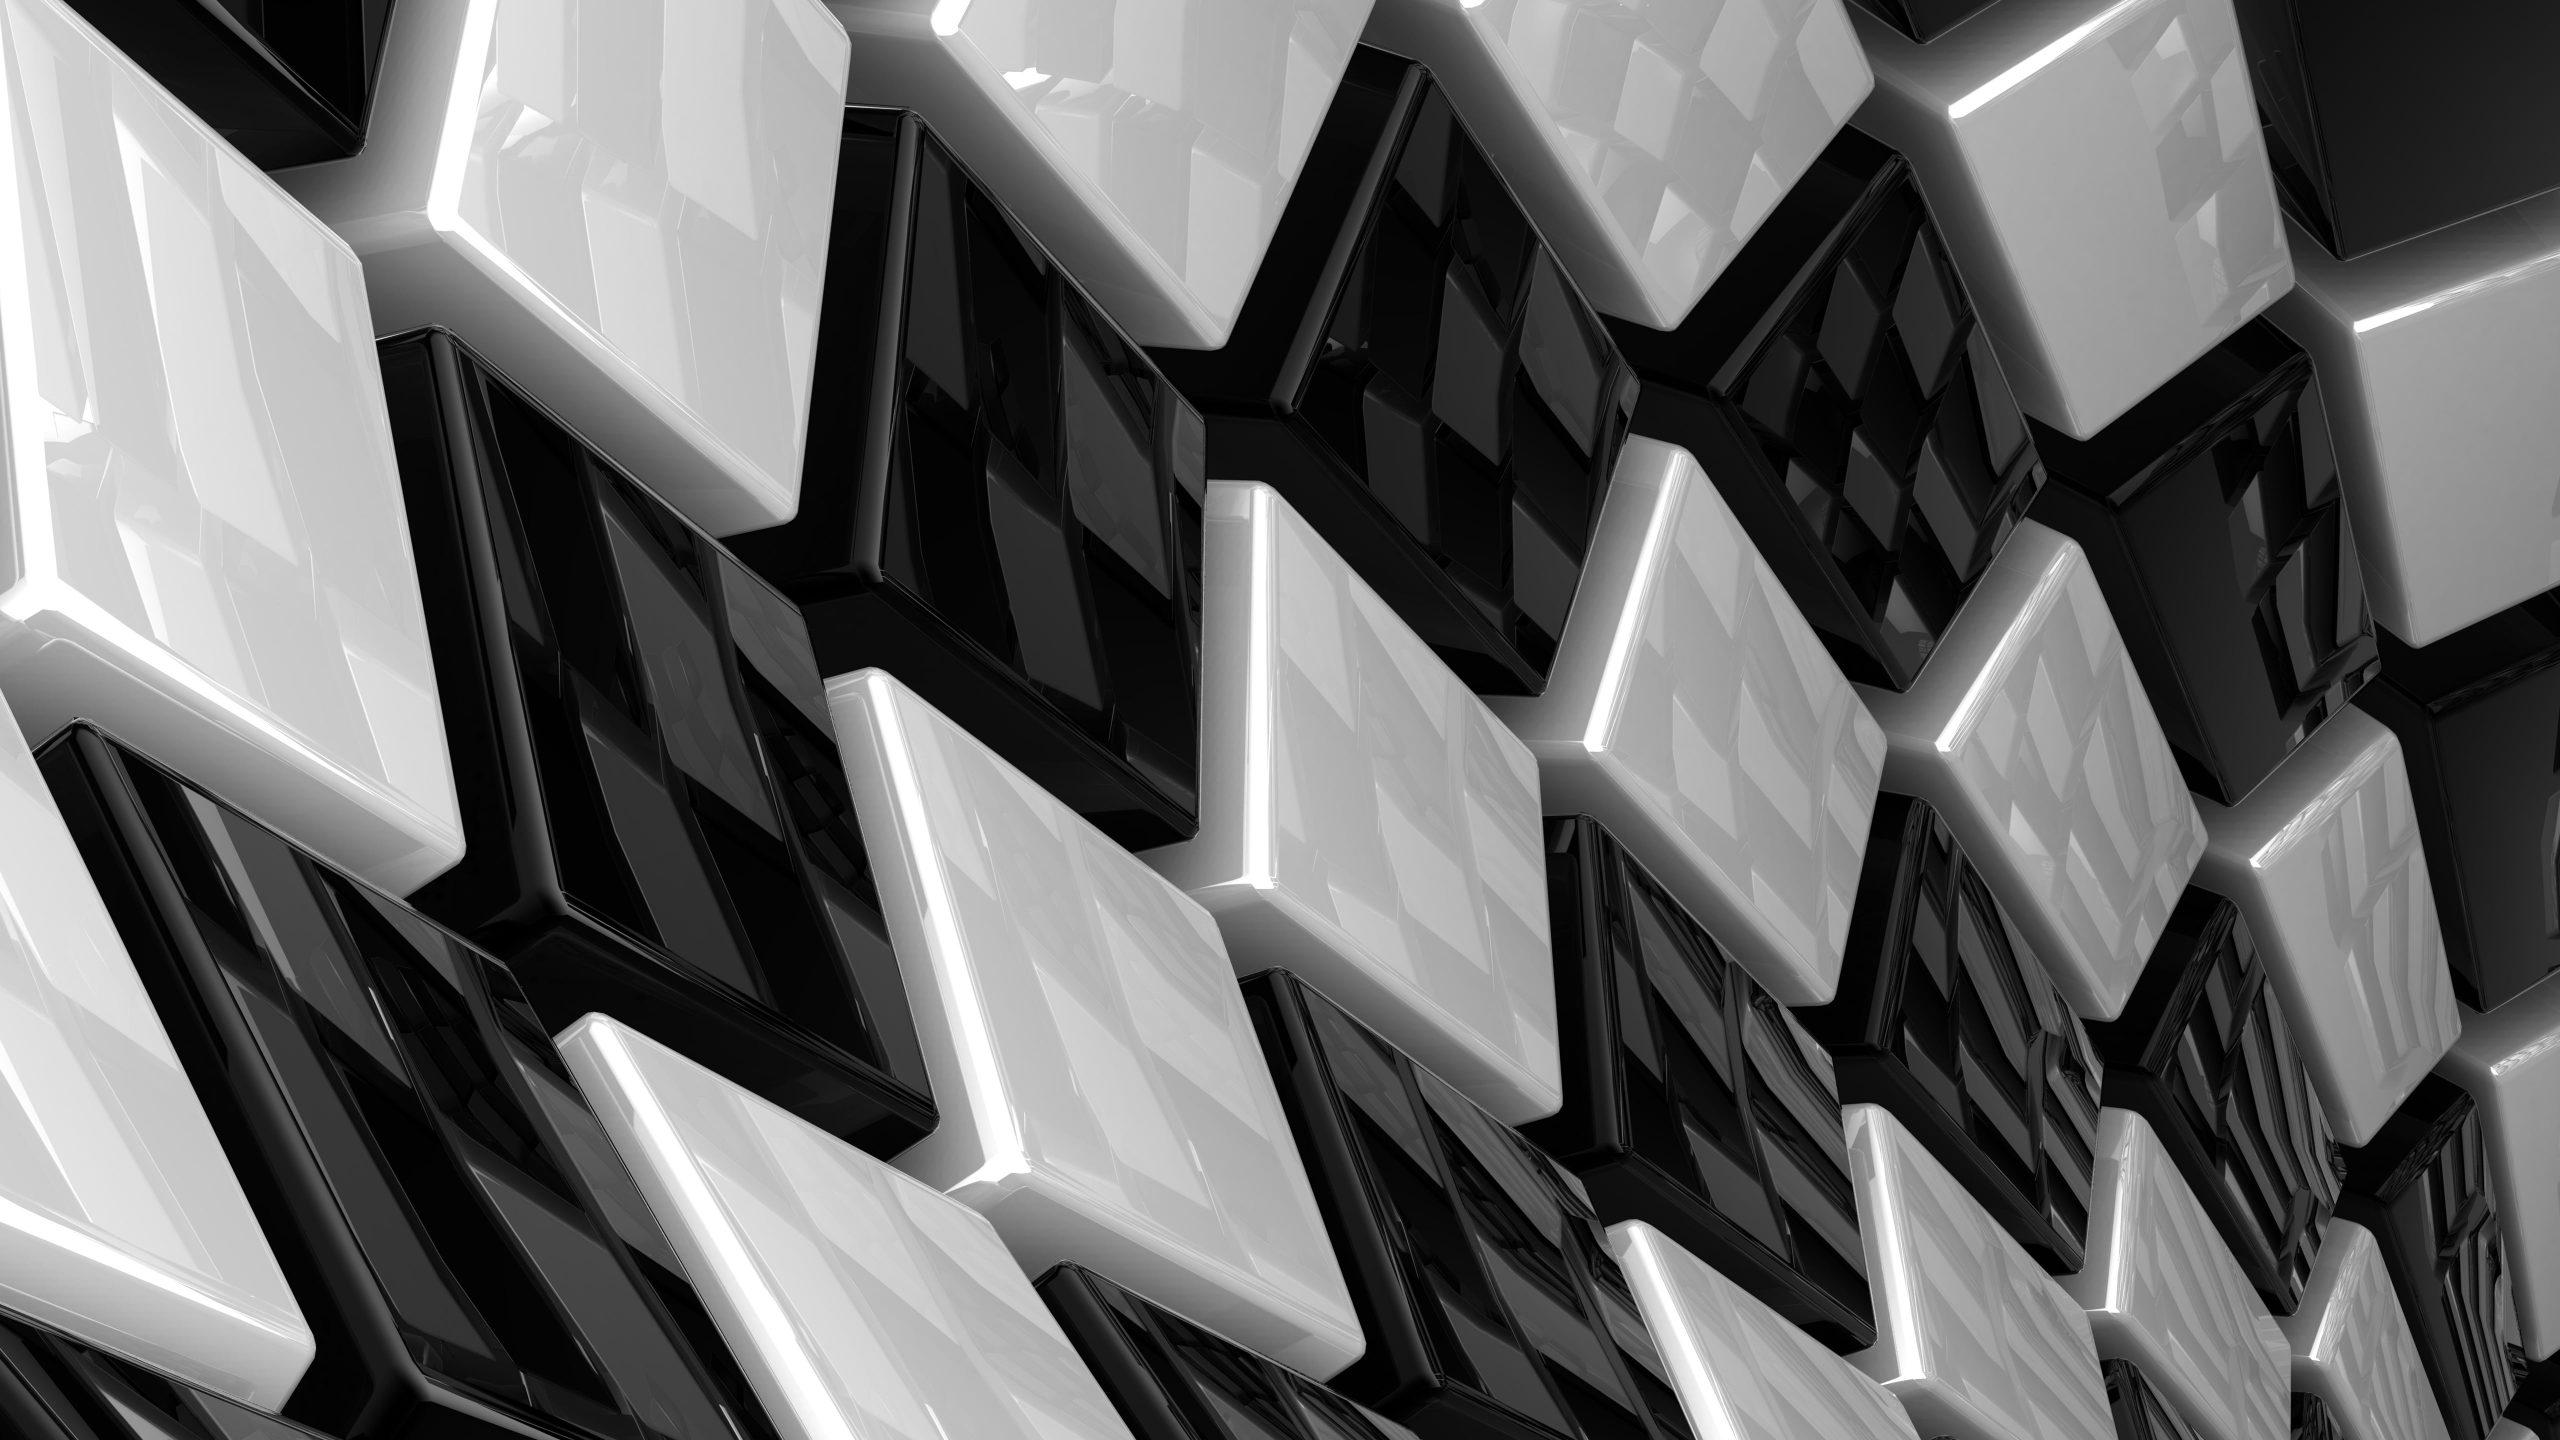 Abstract Wallpaper